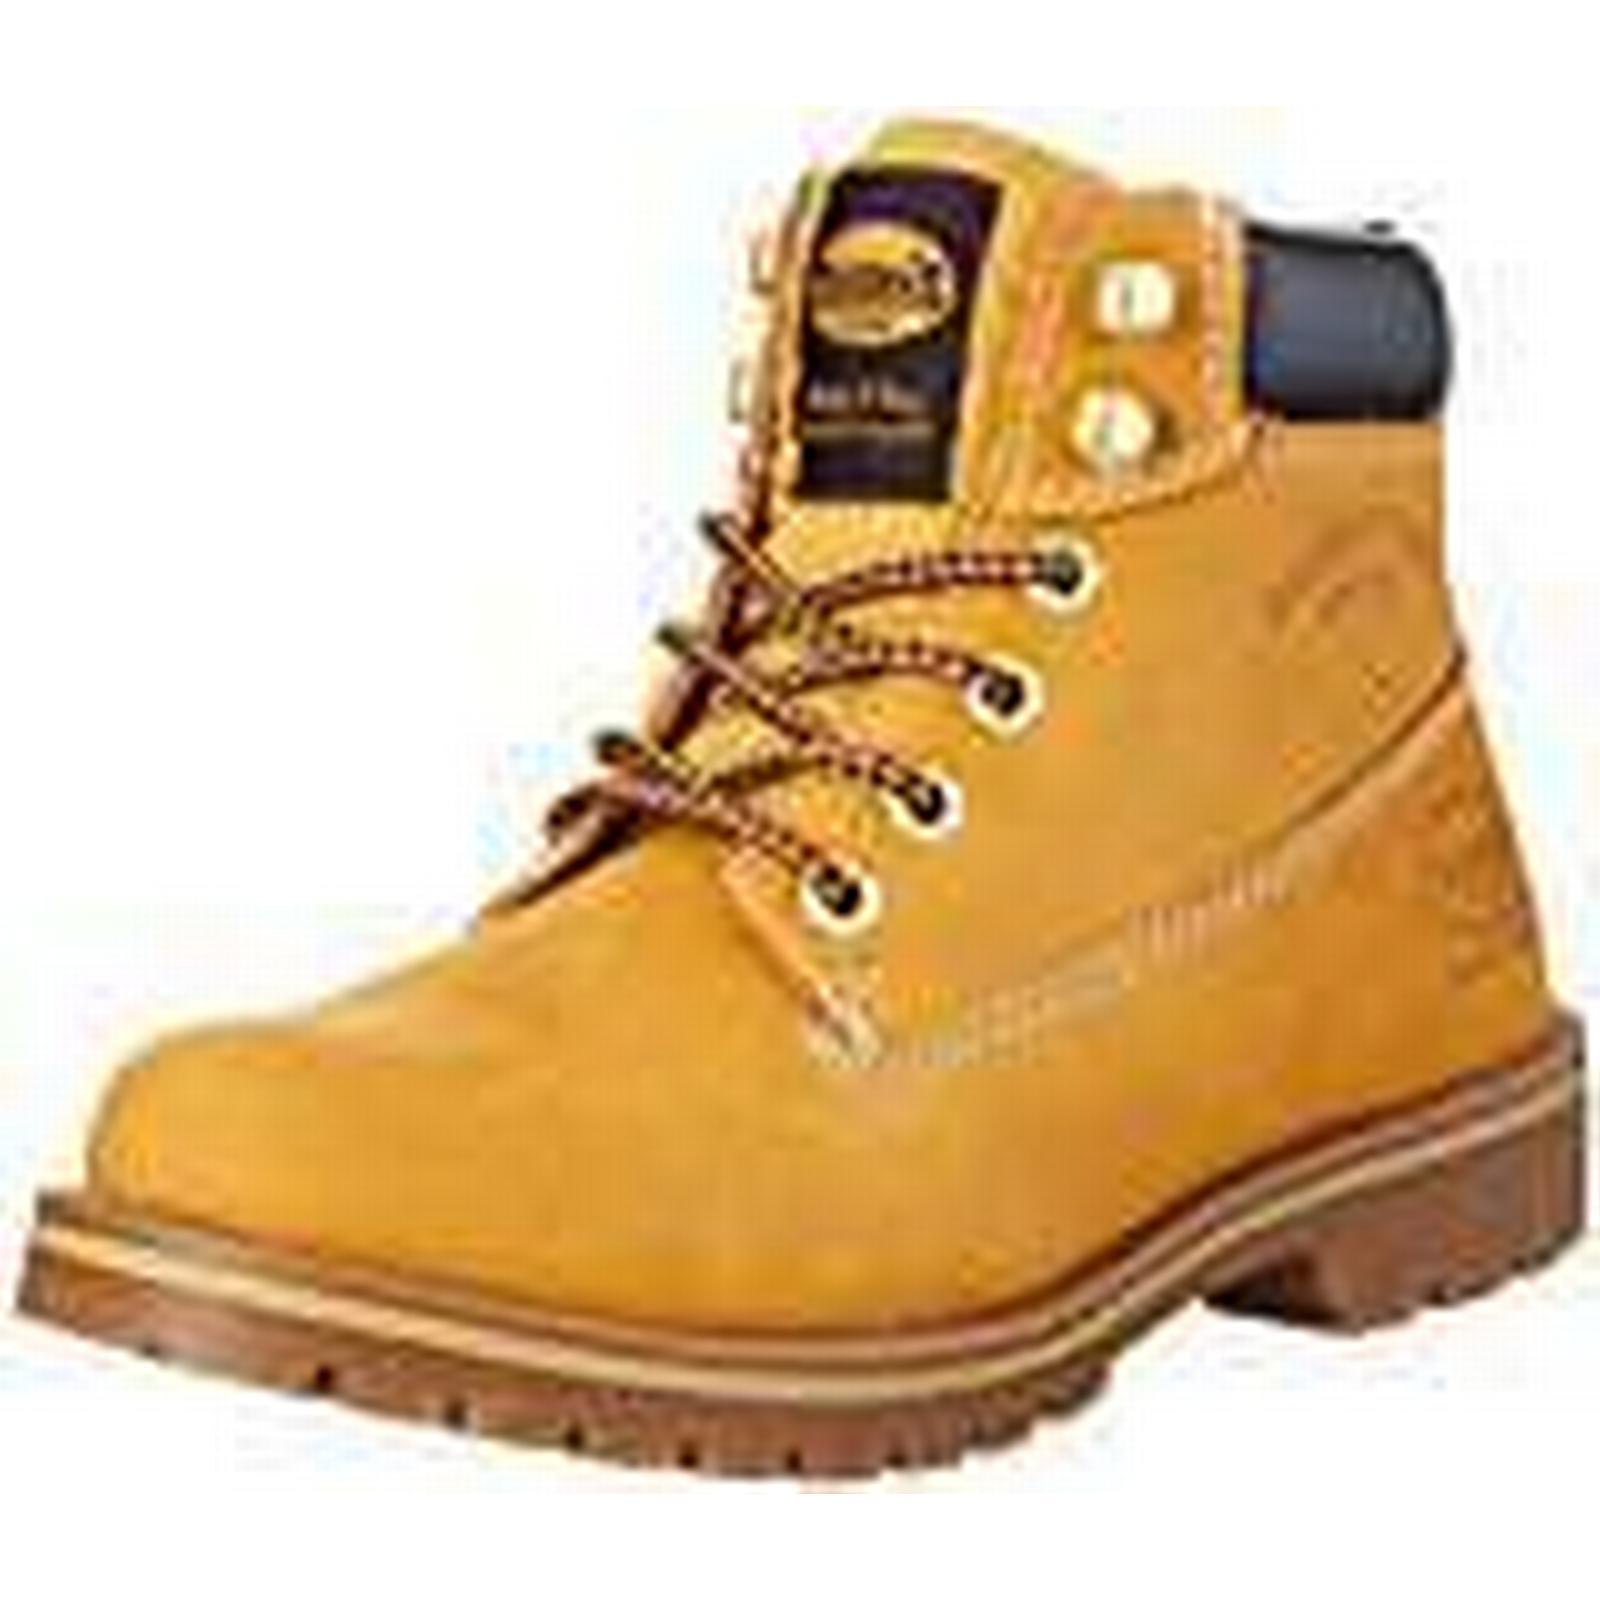 Dockers Shoes Uk